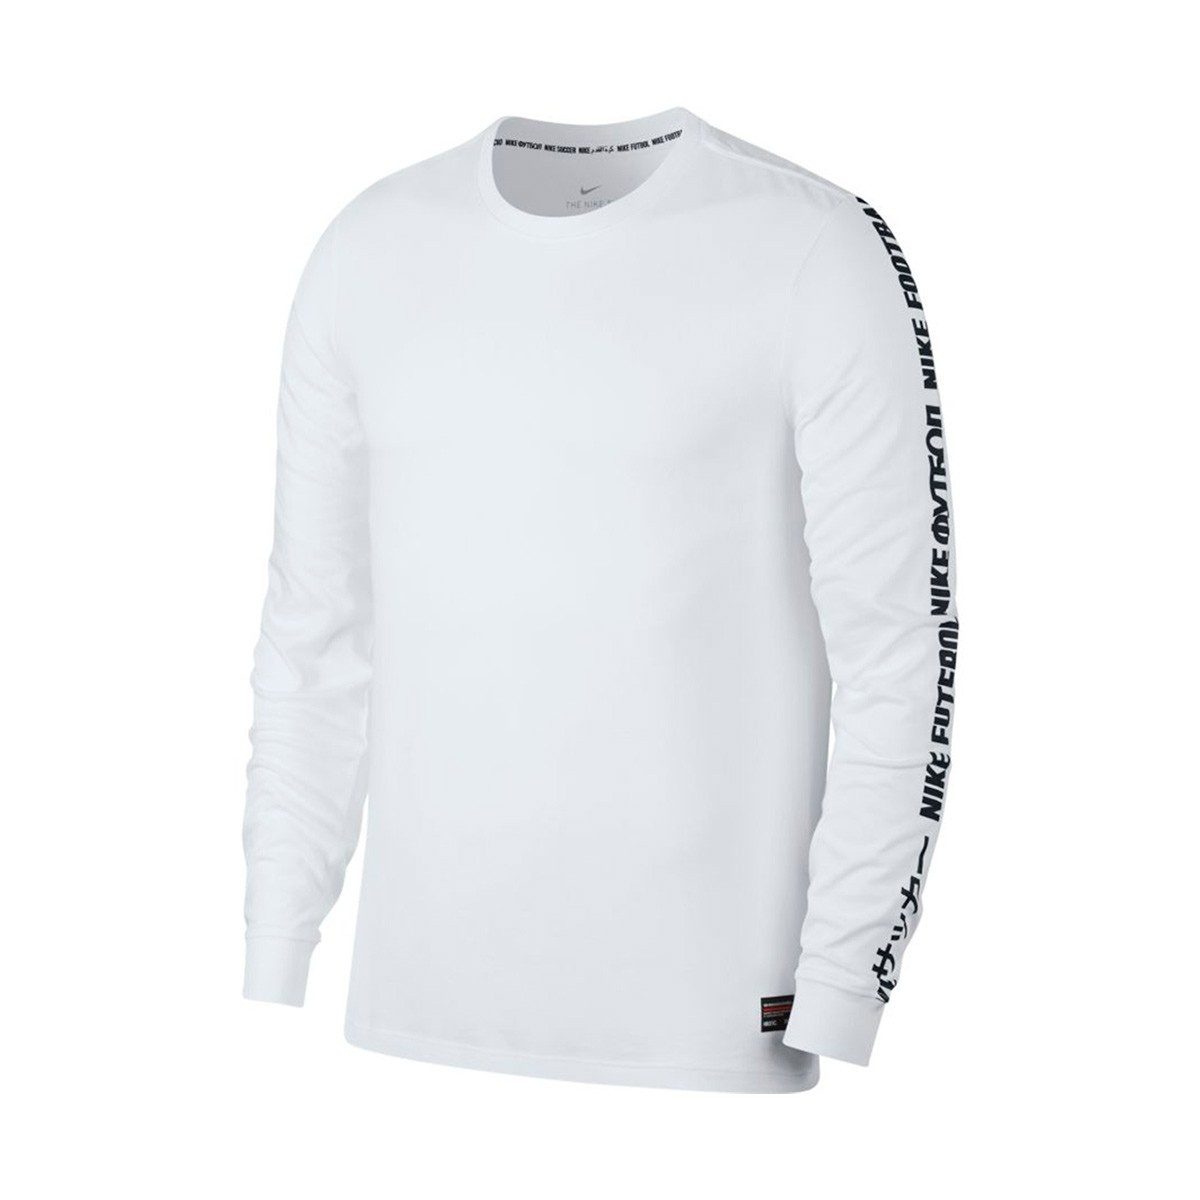 7494e79a Jersey Nike Nike F.C. Dry Stripe White - Football store Fútbol Emotion